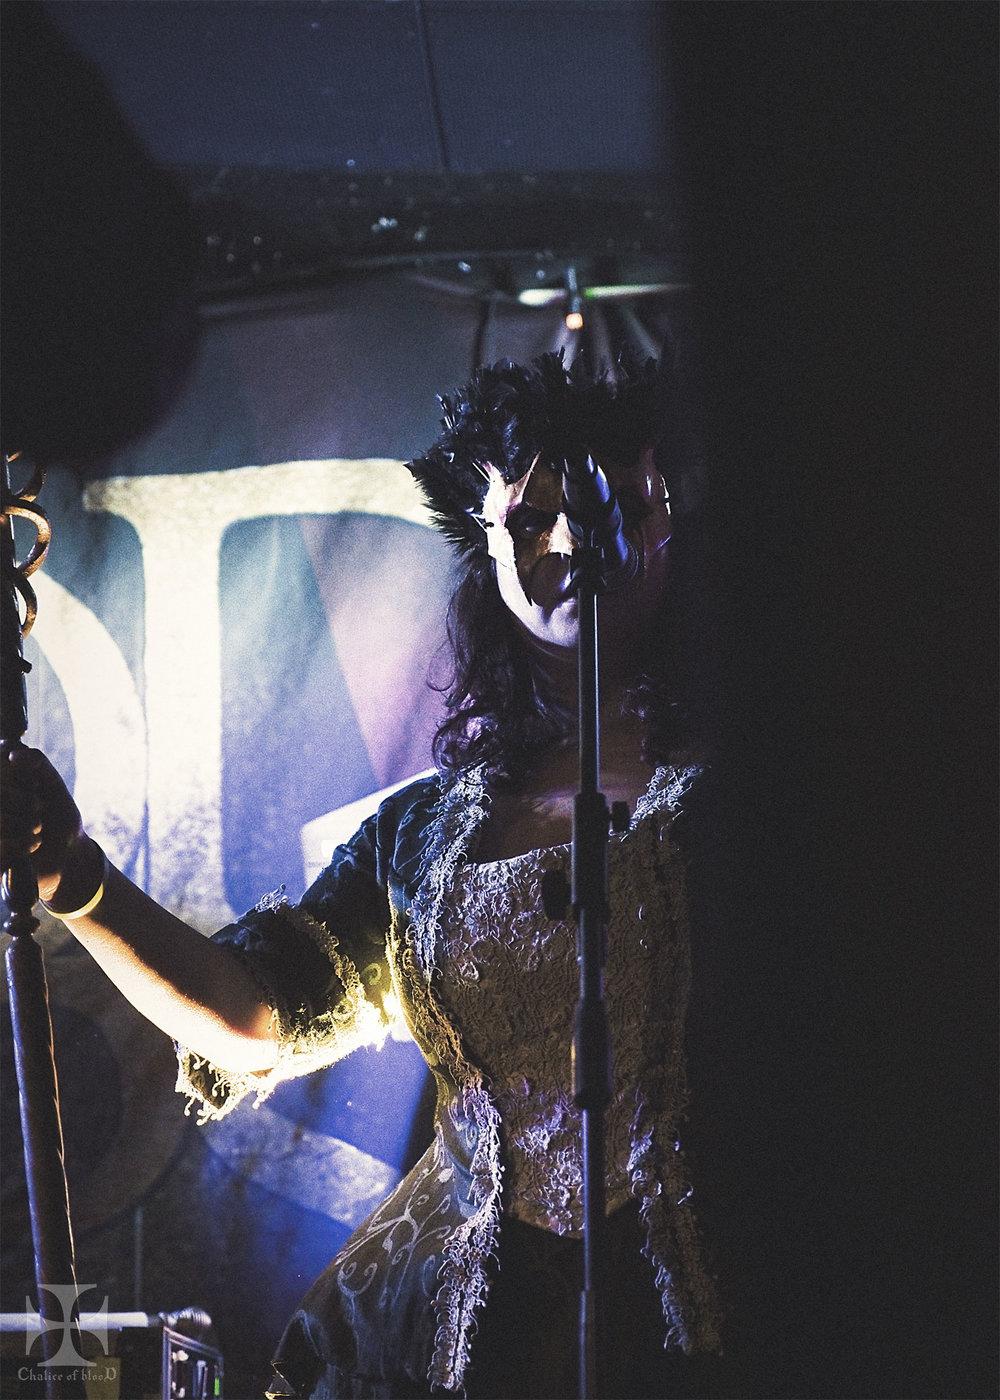 Fleshgod-Apocalypse-0124-Exposure-watermarked.jpg